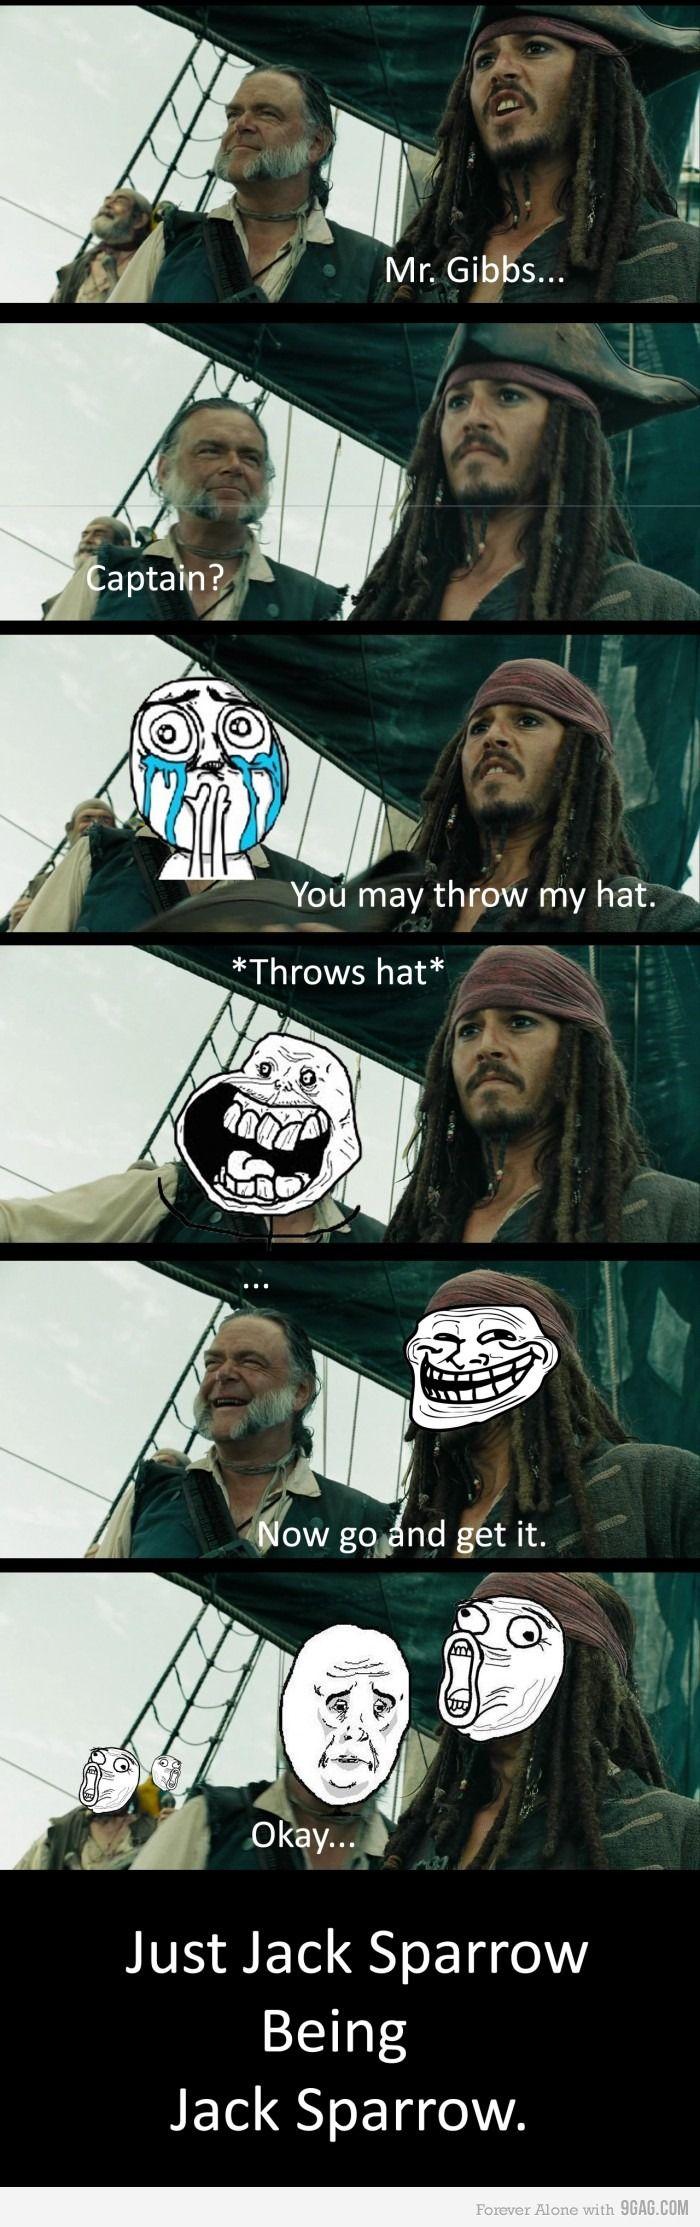 Just Jack Sparrow.